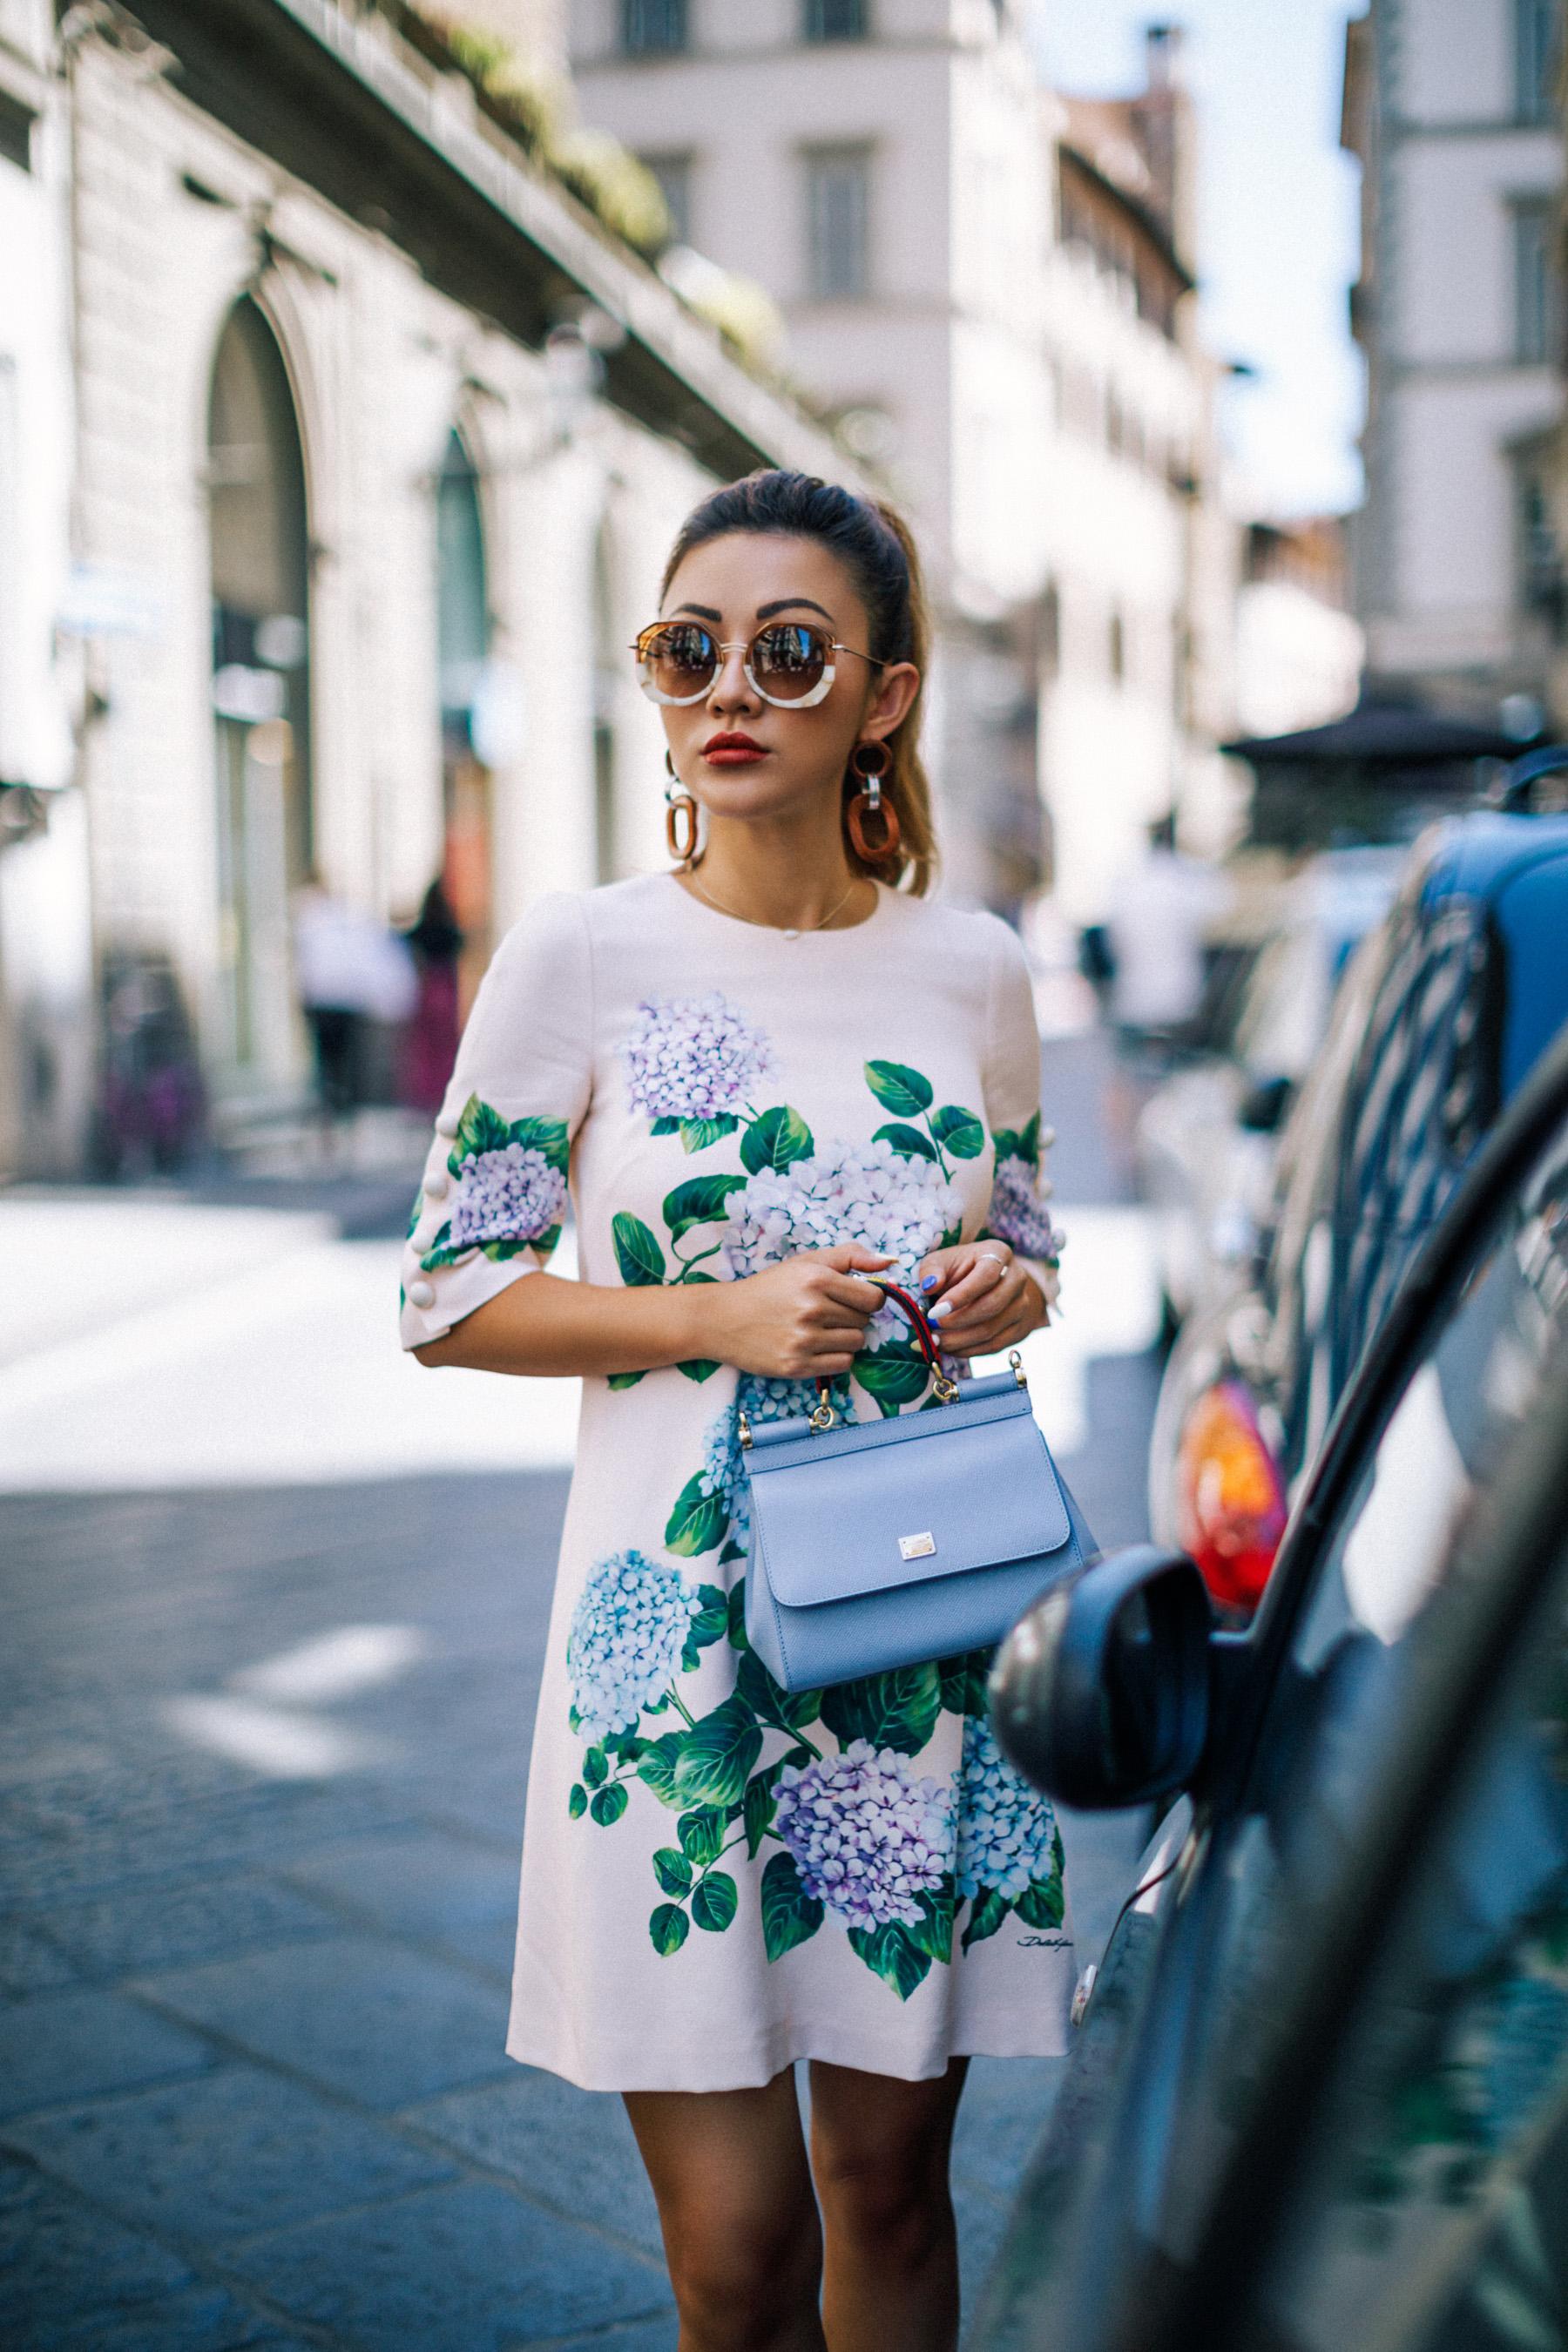 Dolce & Gabbana Hydrangea Shift Dress with Sunglasses // NotJessFashion.com